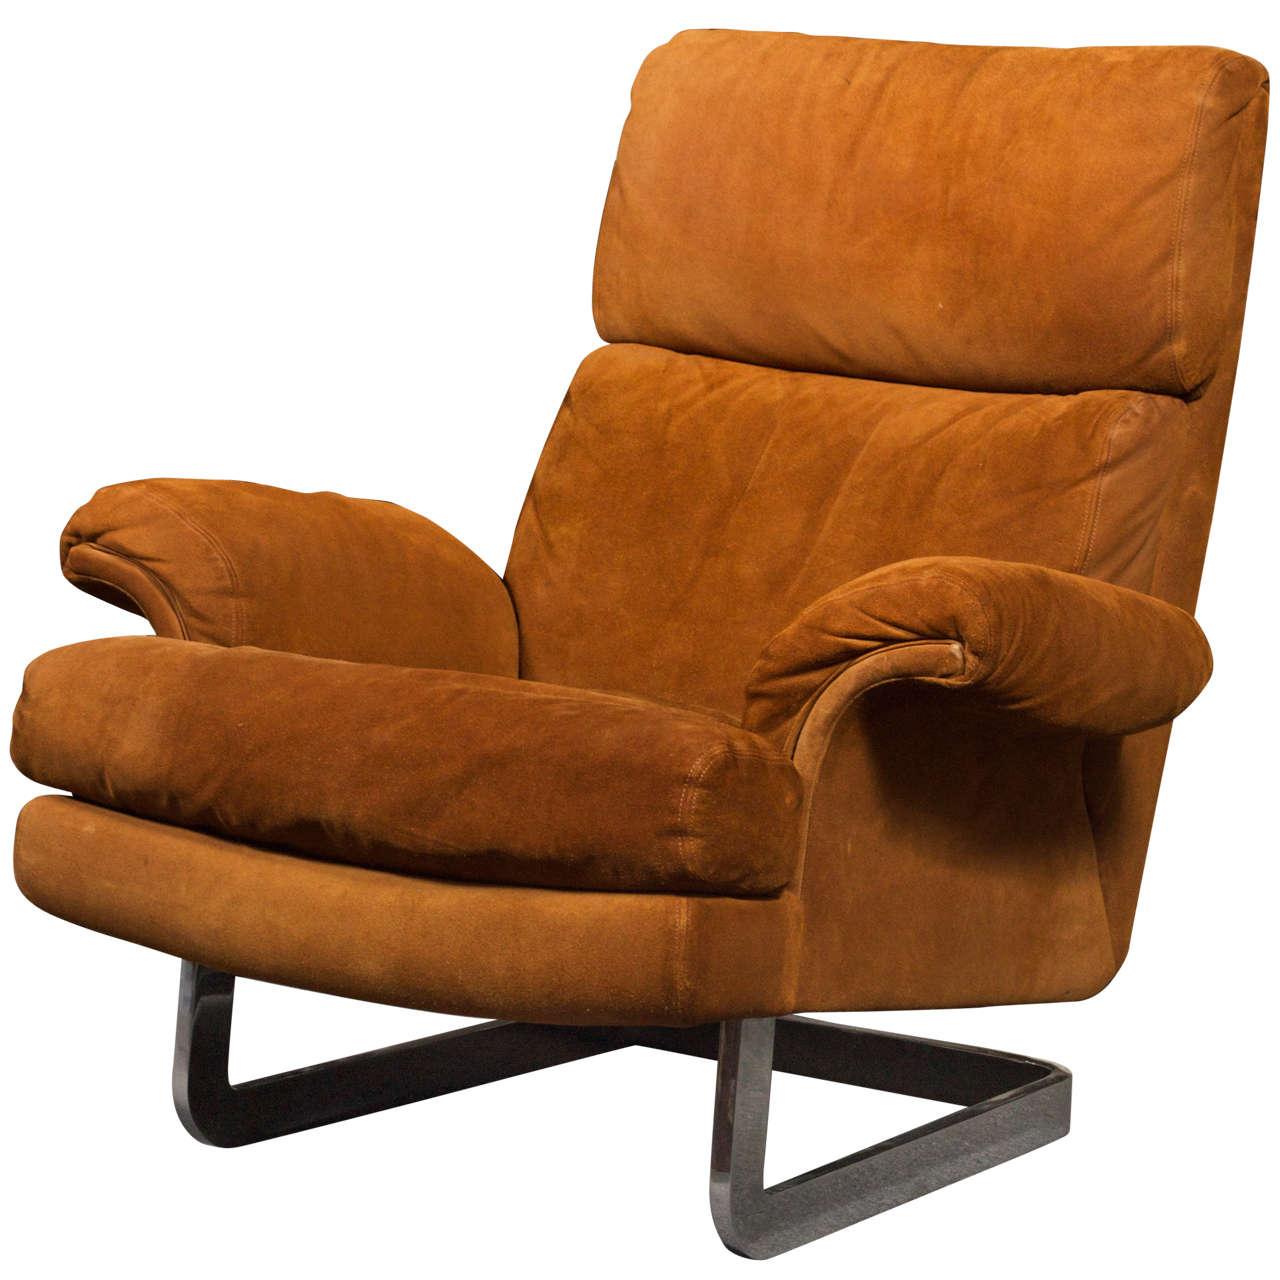 1970 s Metropolitan Suede Lounge Chair Saturday Sale